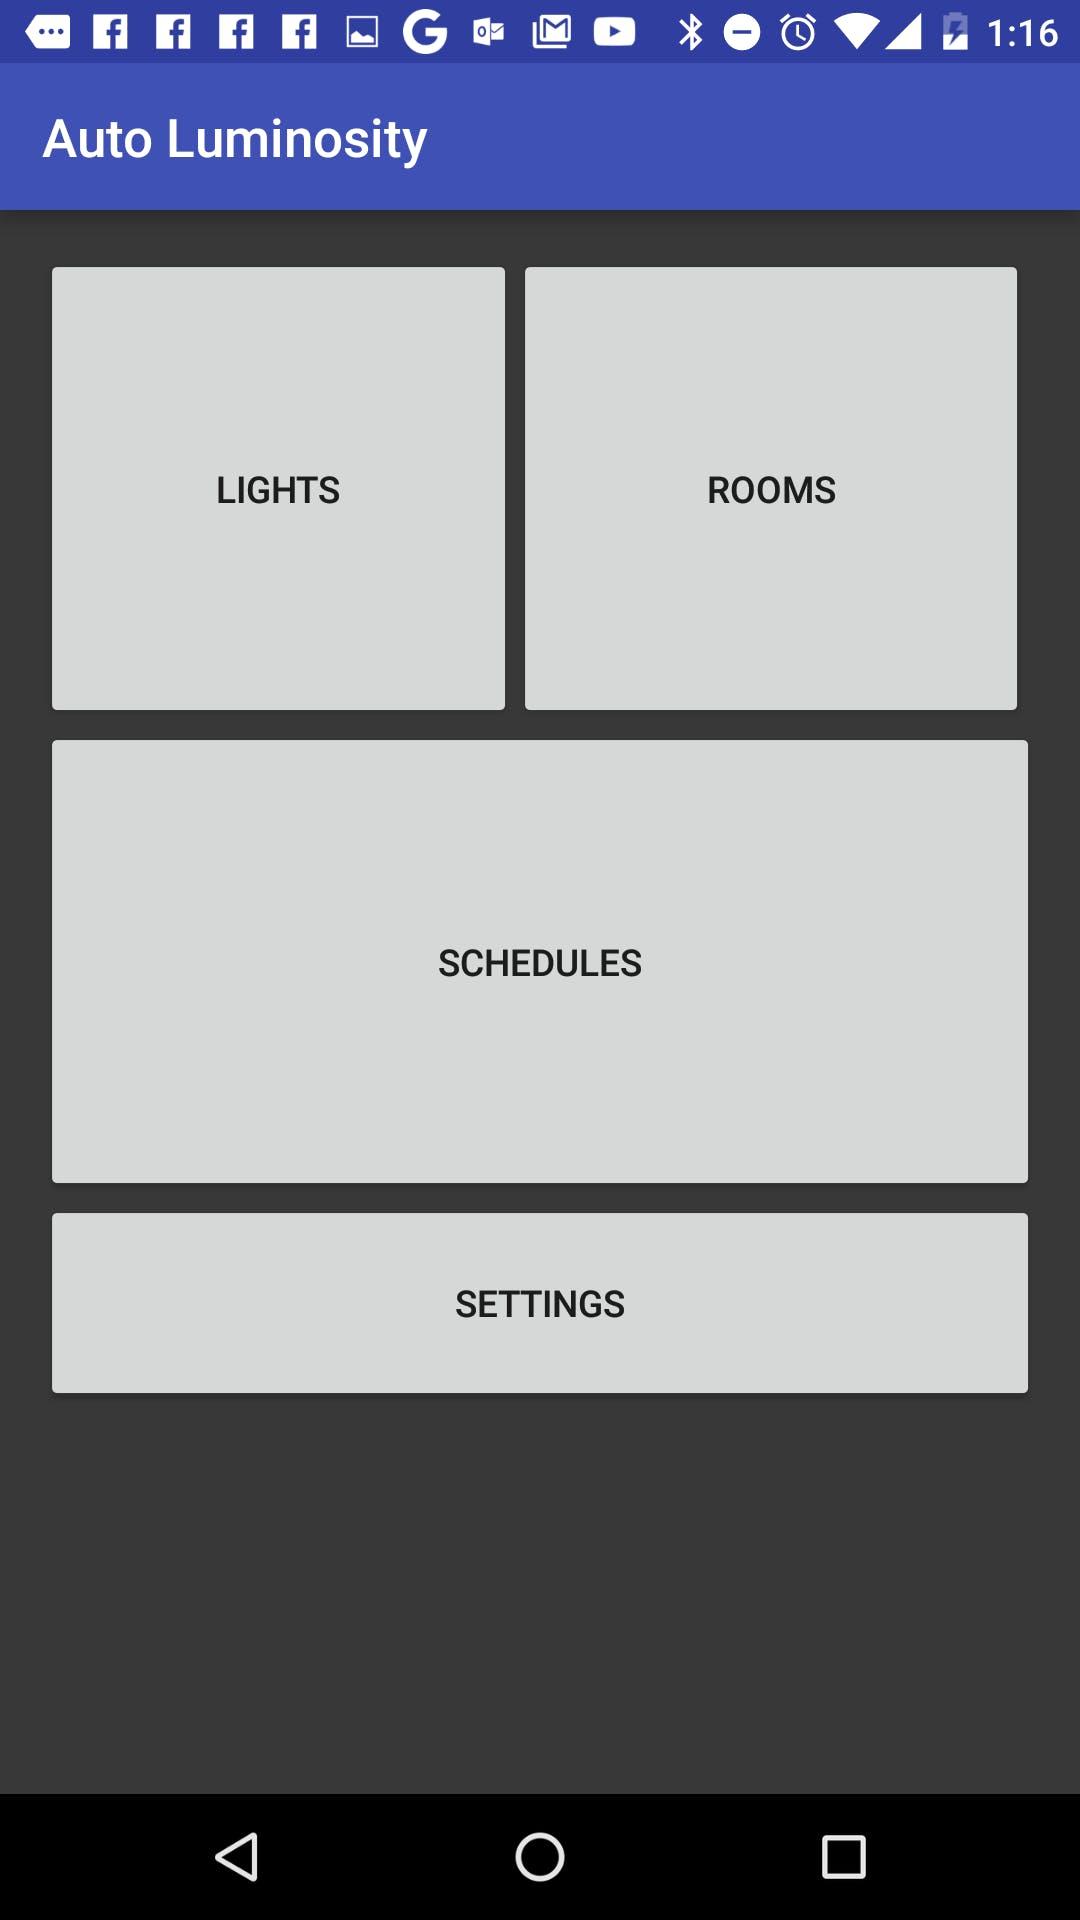 Main Activity (tiled layout)